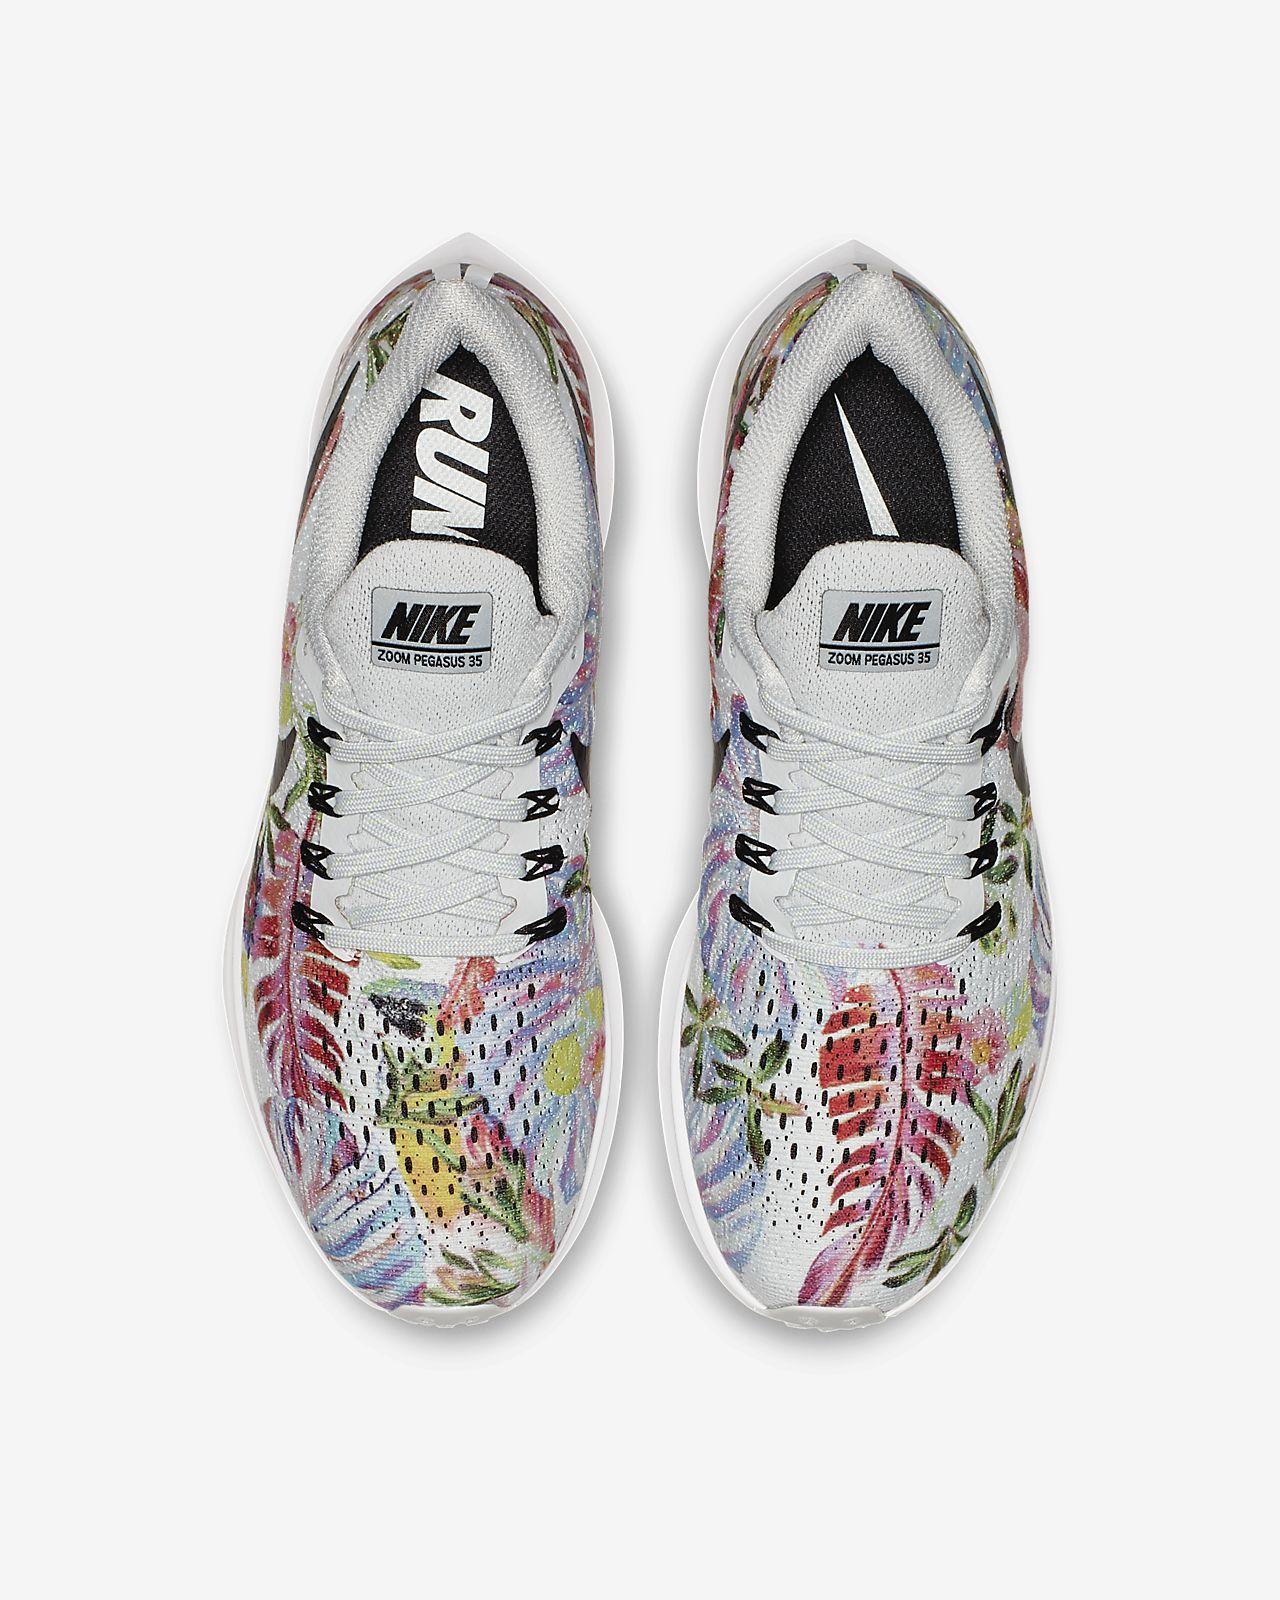 fdee503bbf90 Nike Air Zoom Pegasus 35 Floral Women s Running Shoe. Nike.com SG